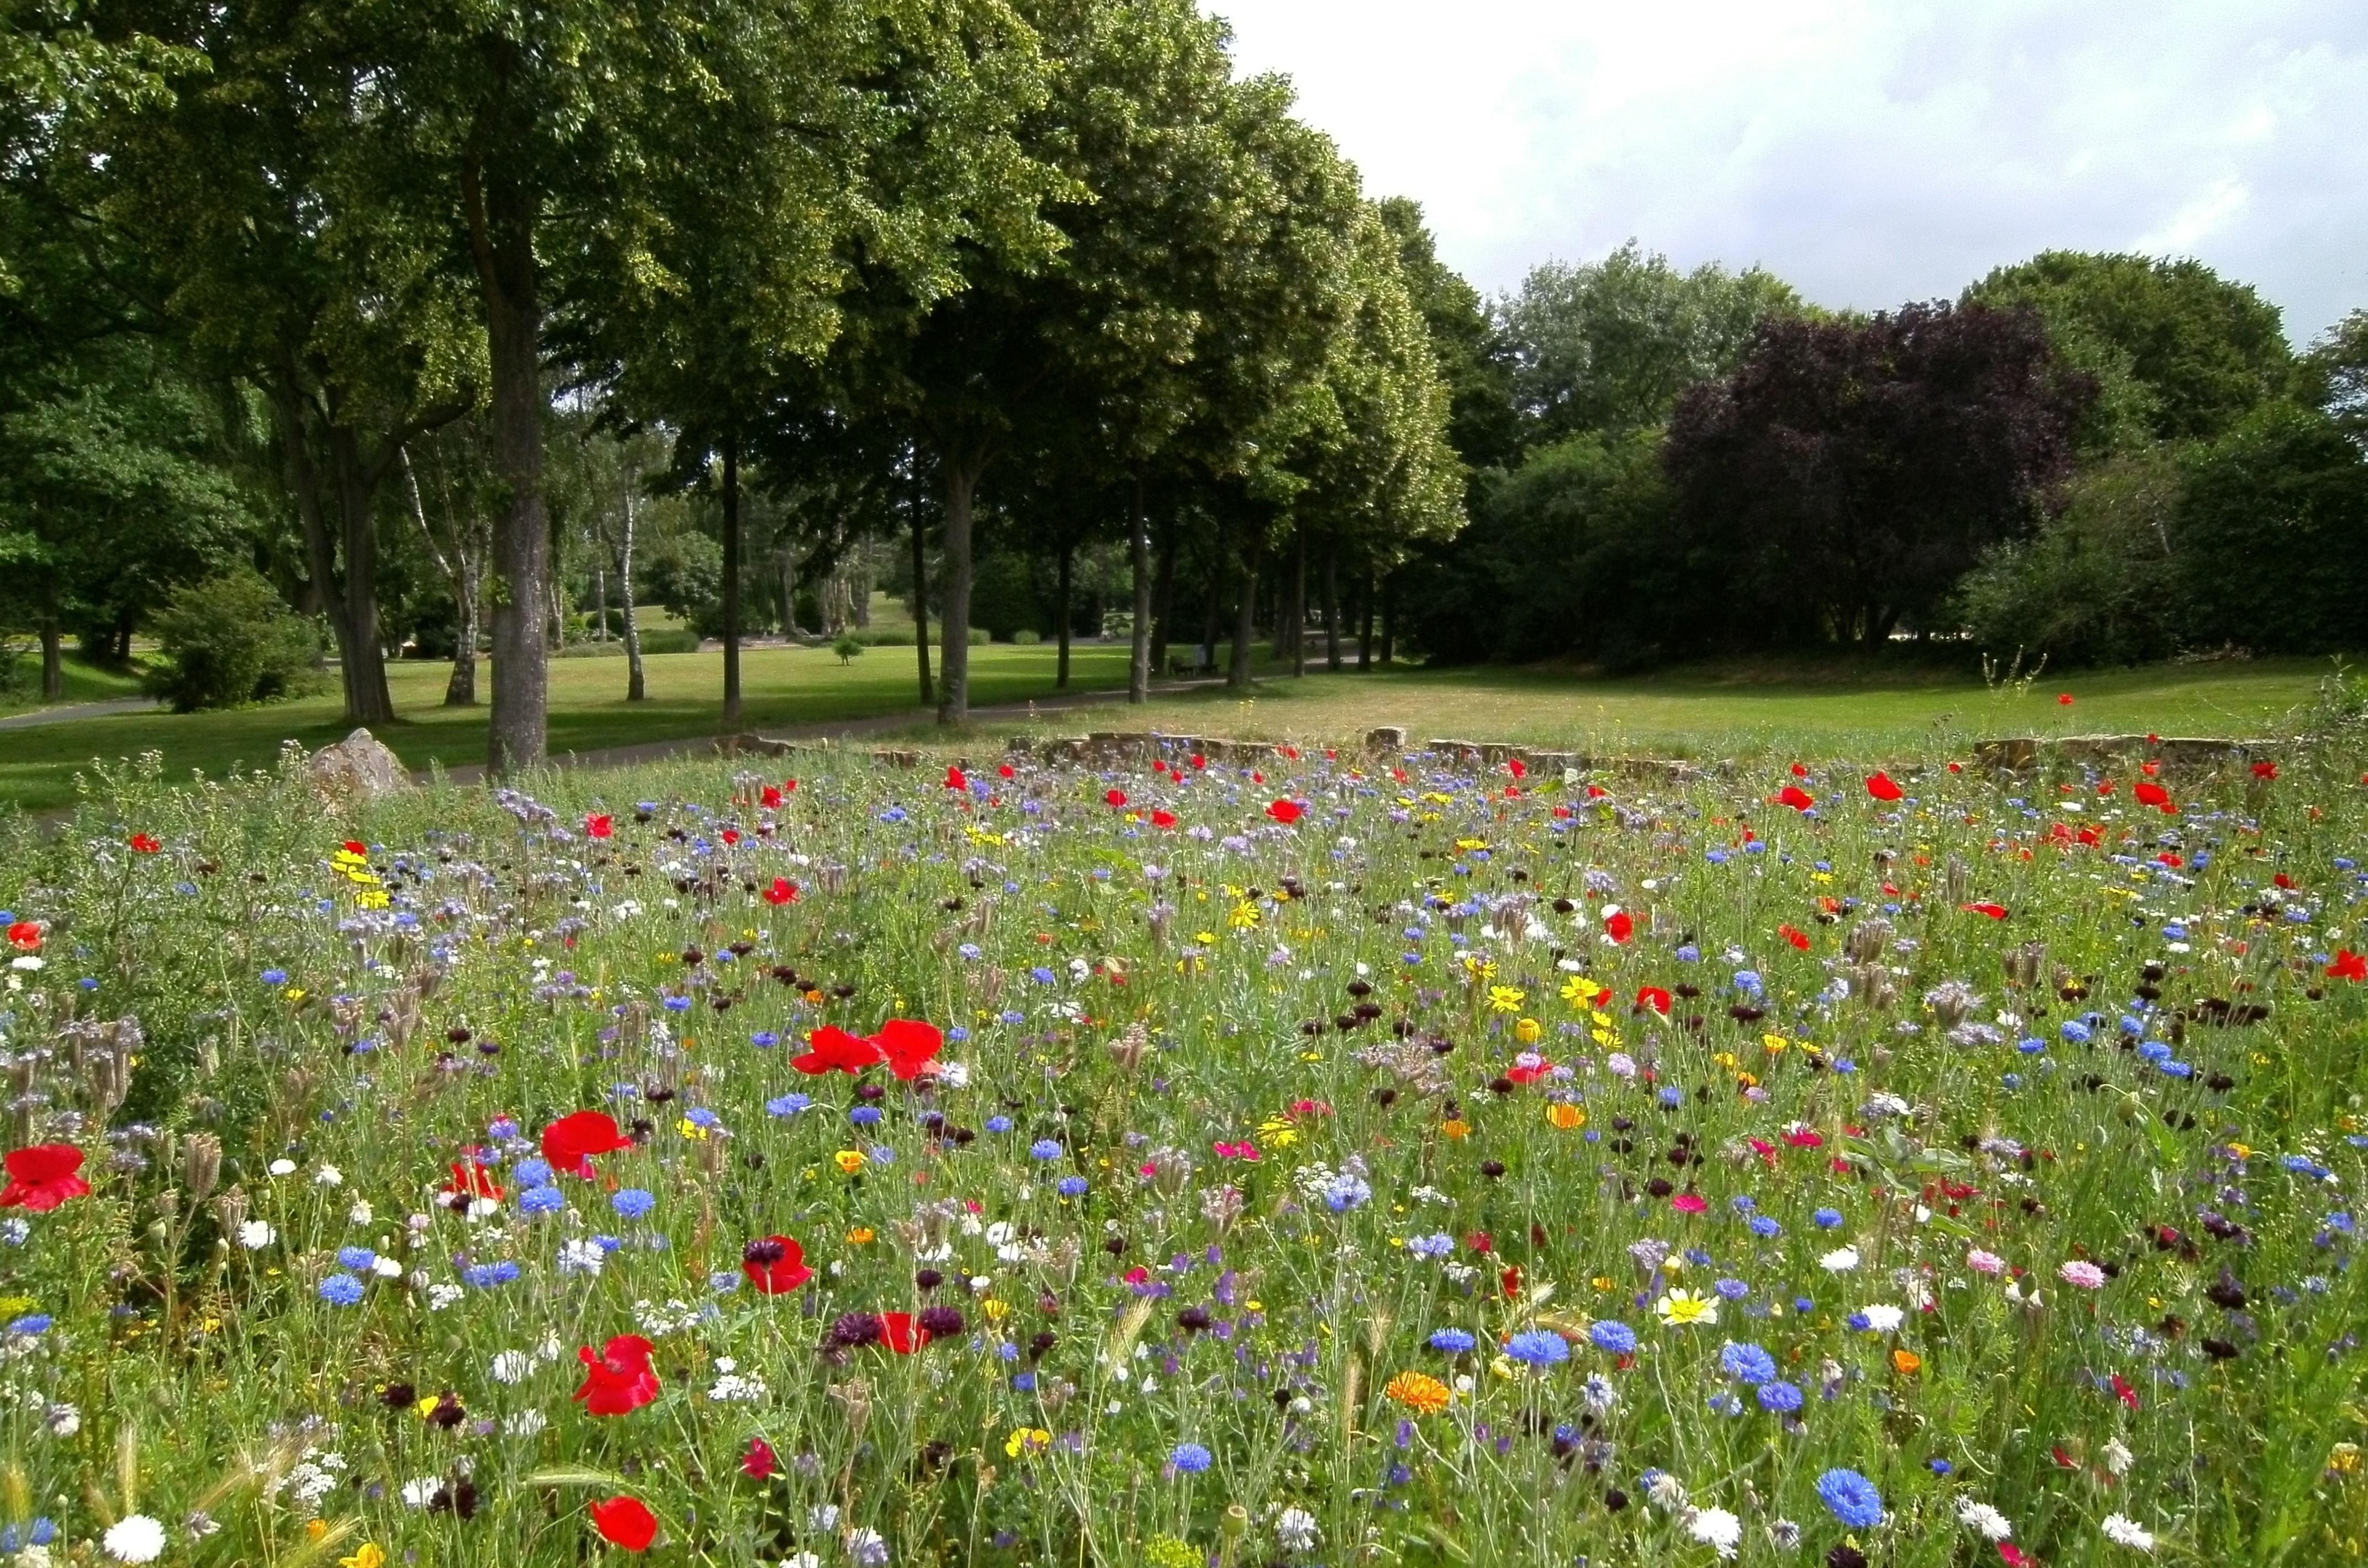 Lilleaas Sinu aias